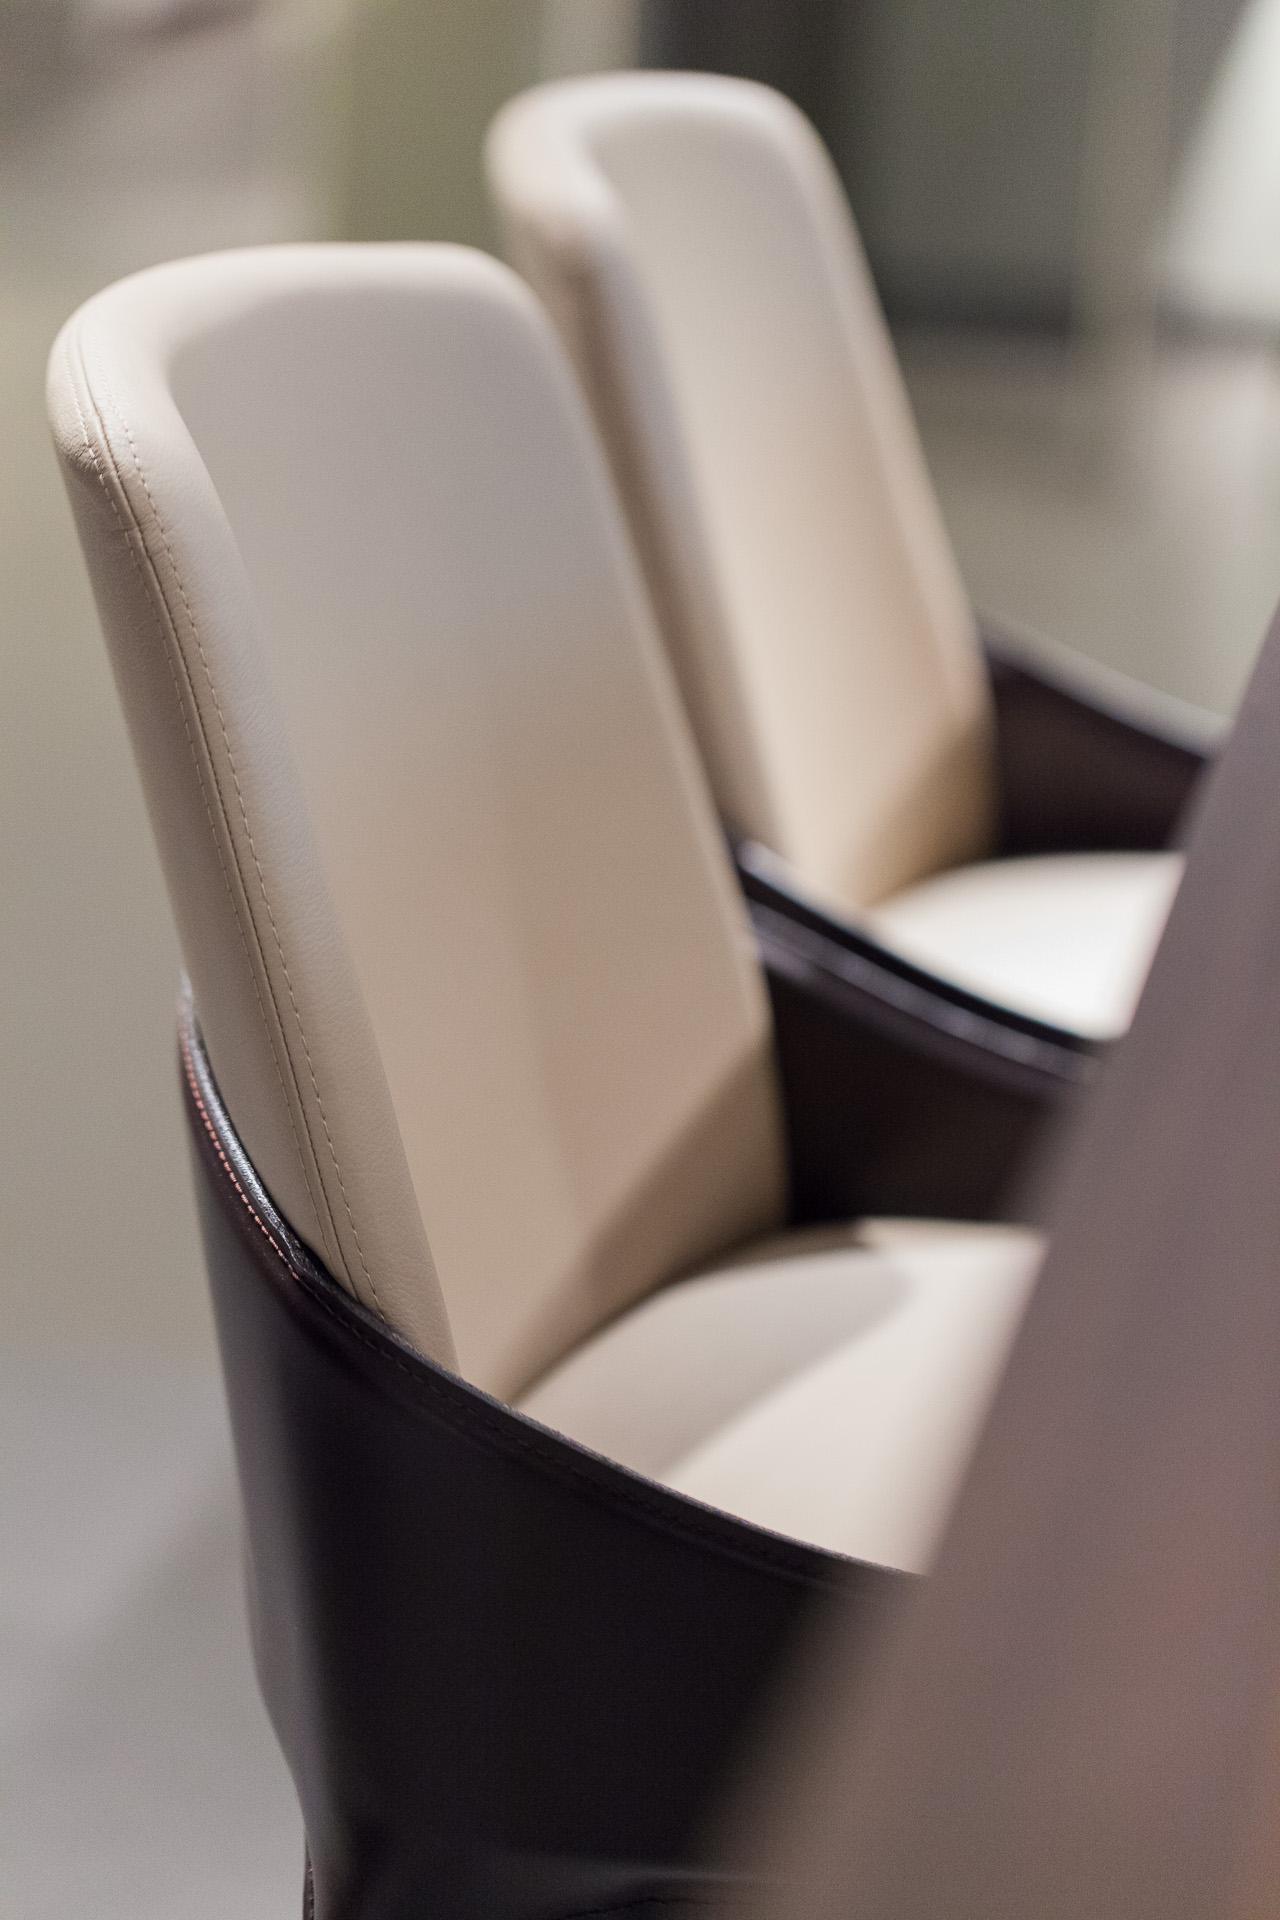 Showroom Binacci: sedie Studio Klass per Fiamitalia, designer Marco Maturo